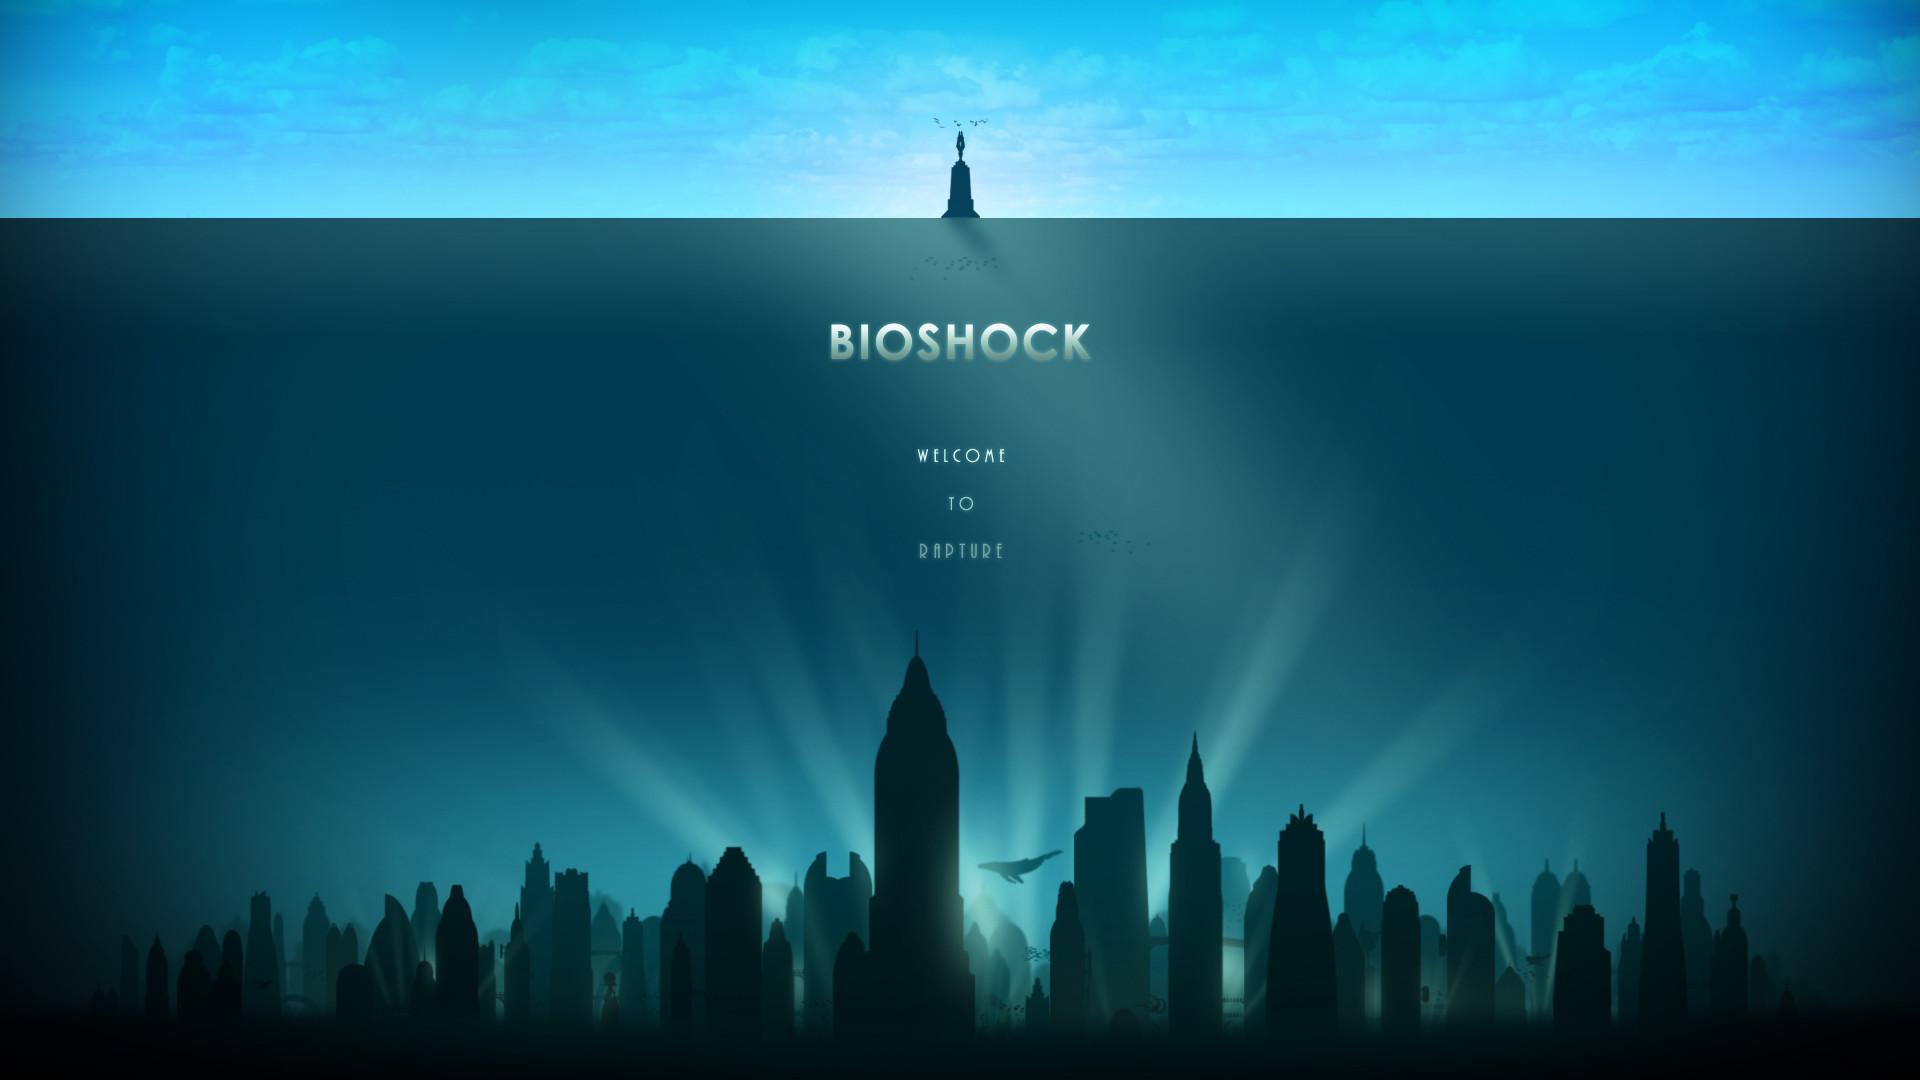 Bioshock HD Wallpapers Backgrounds Wallpaper | HD Wallpapers | Pinterest |  Bioshock, Bioshock rapture and Hd wallpaper